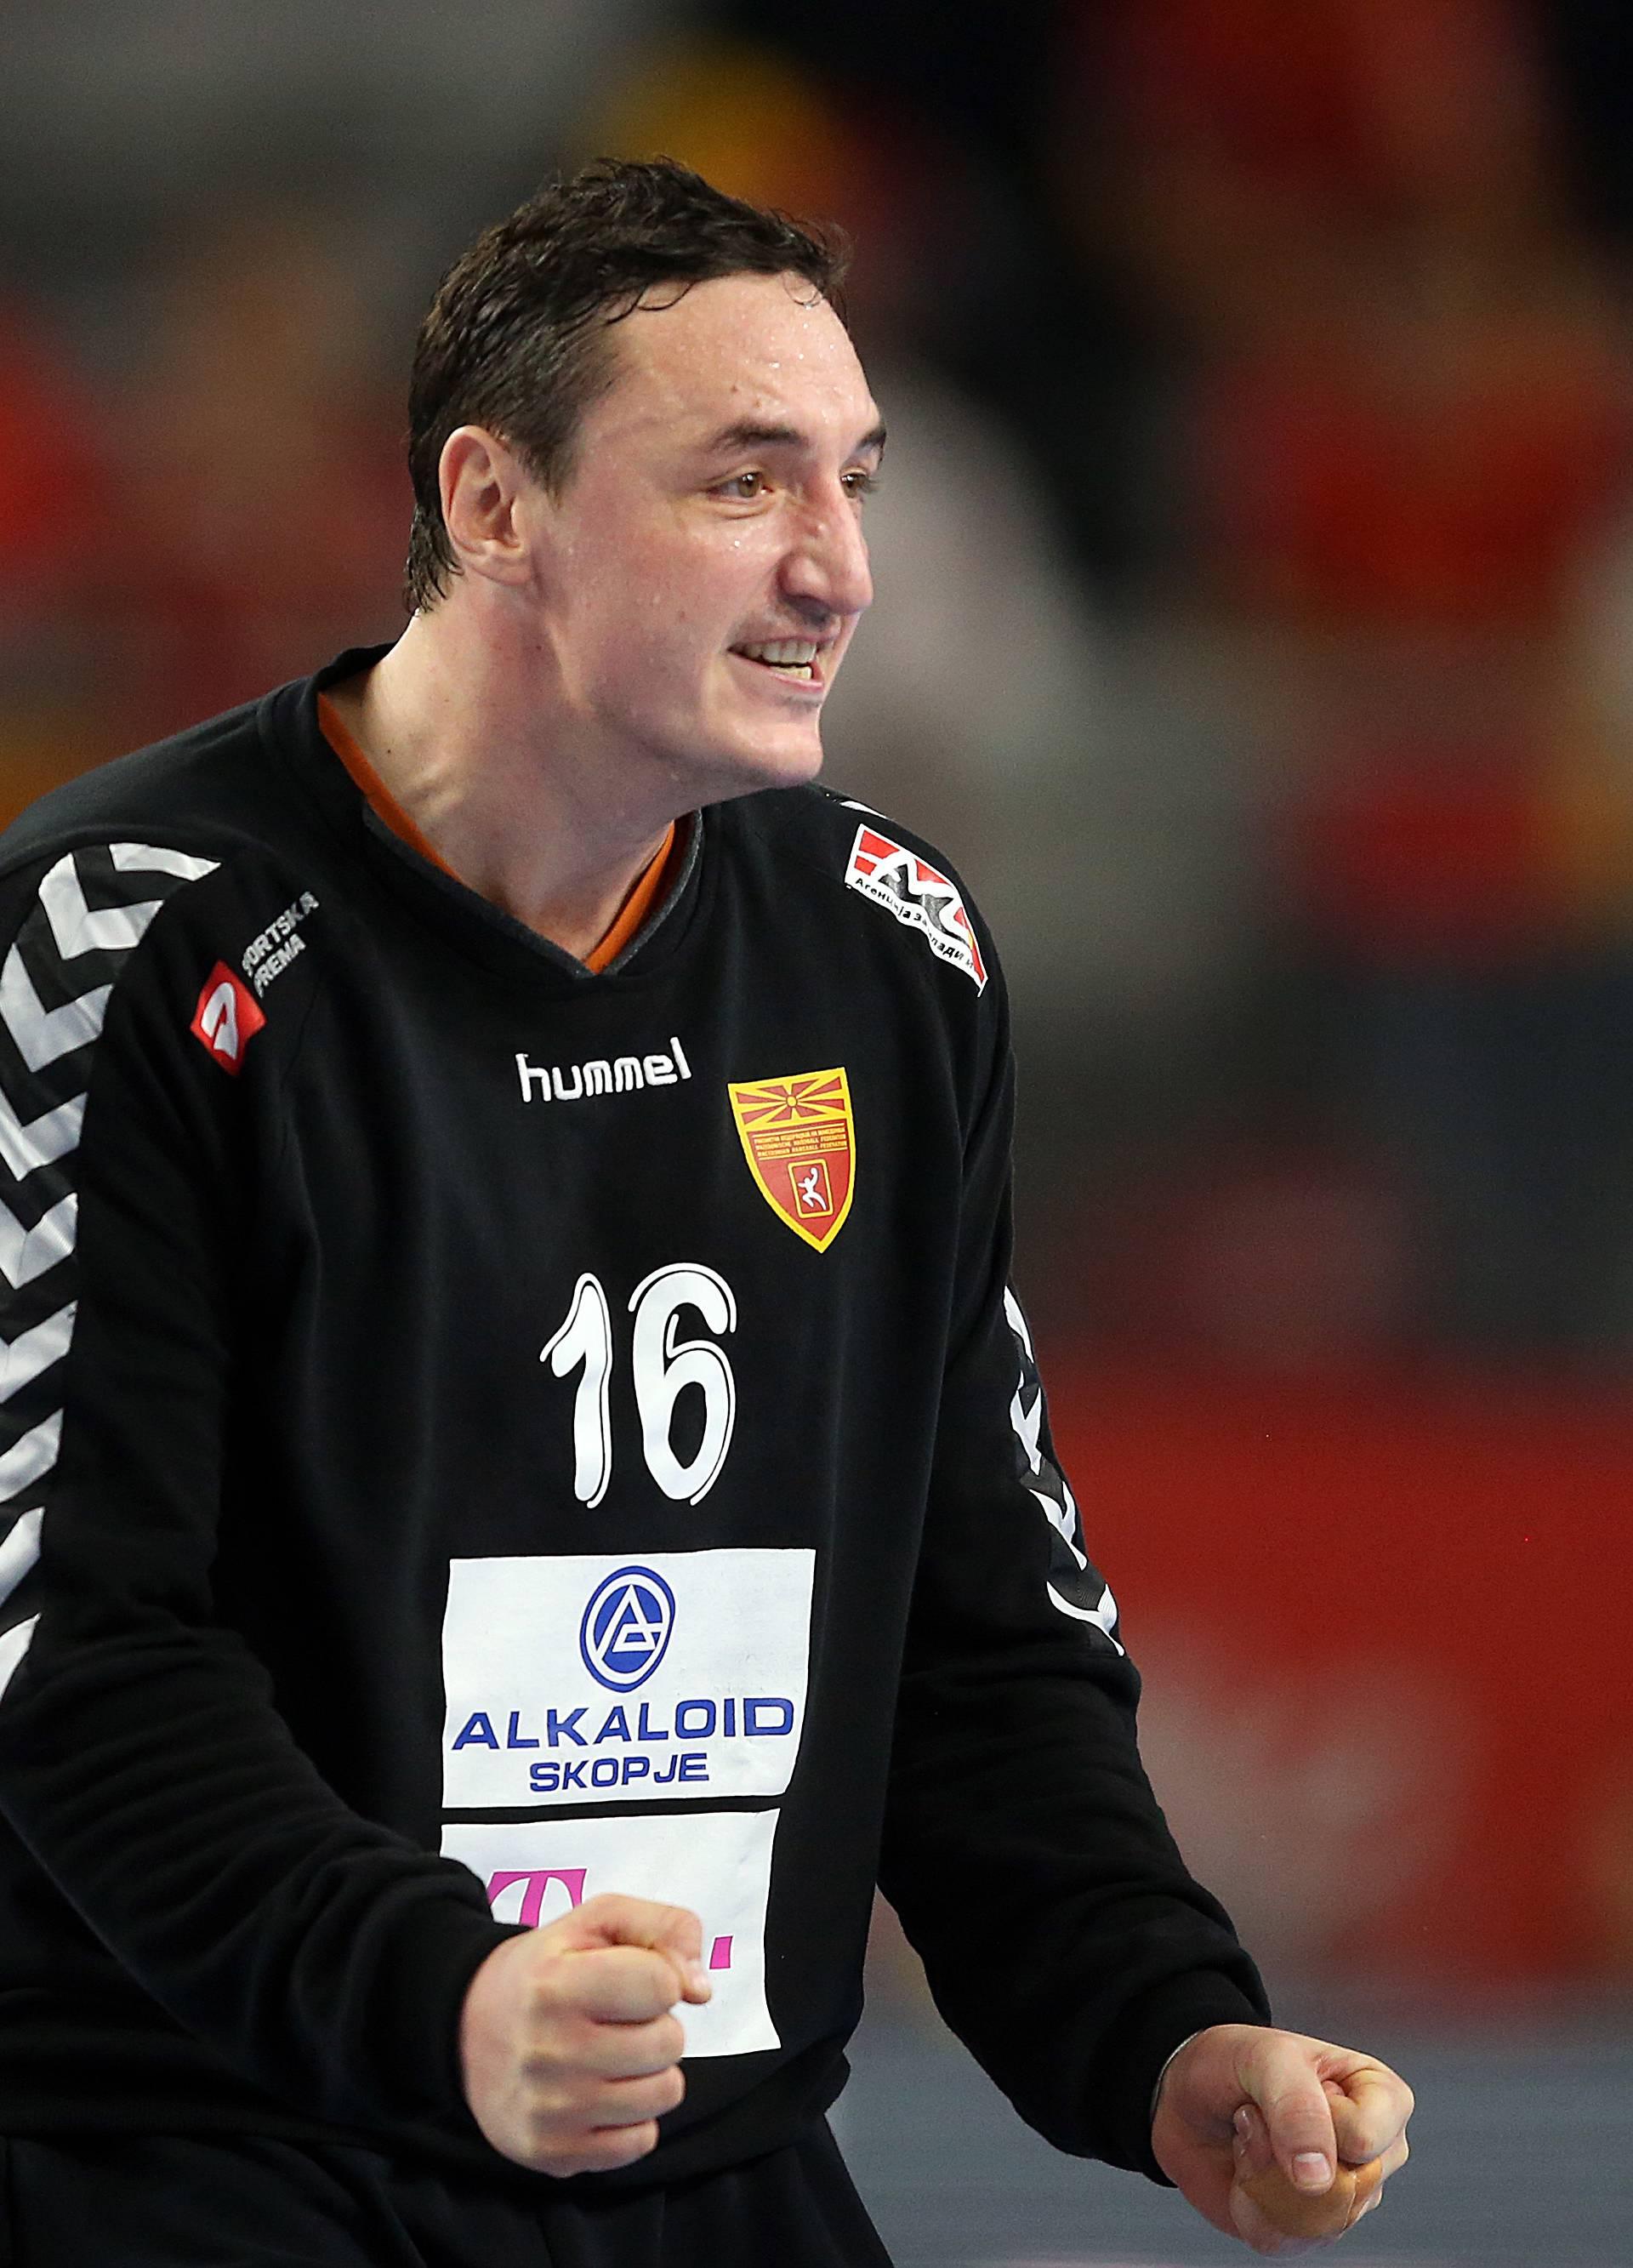 EHF EURO, Makedonija - Ceska